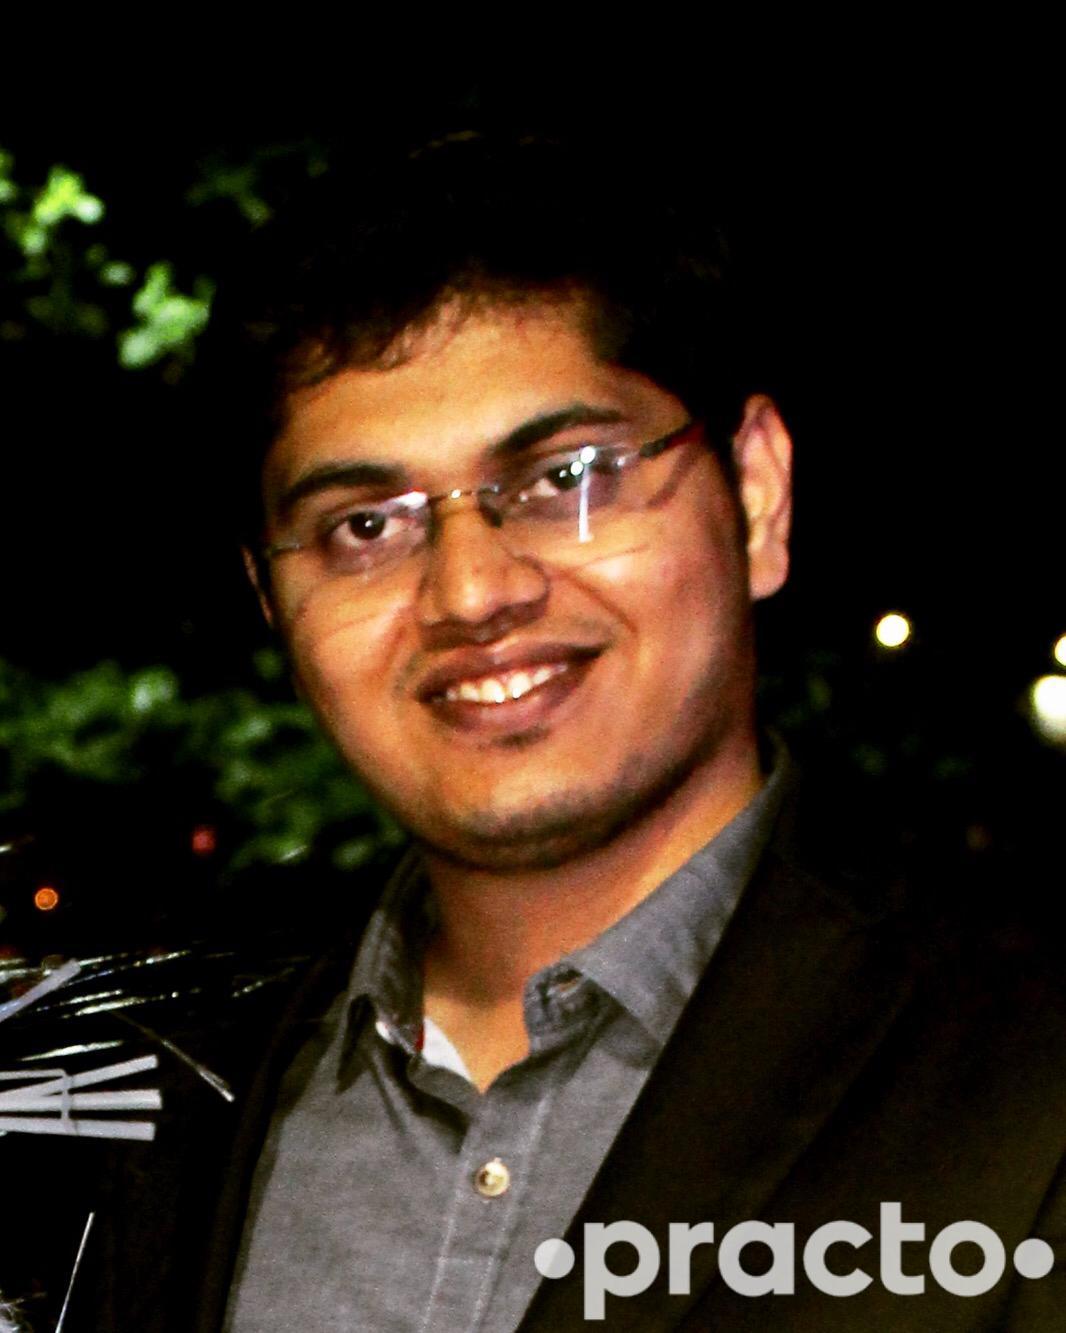 Dr. Abhijeet Patil